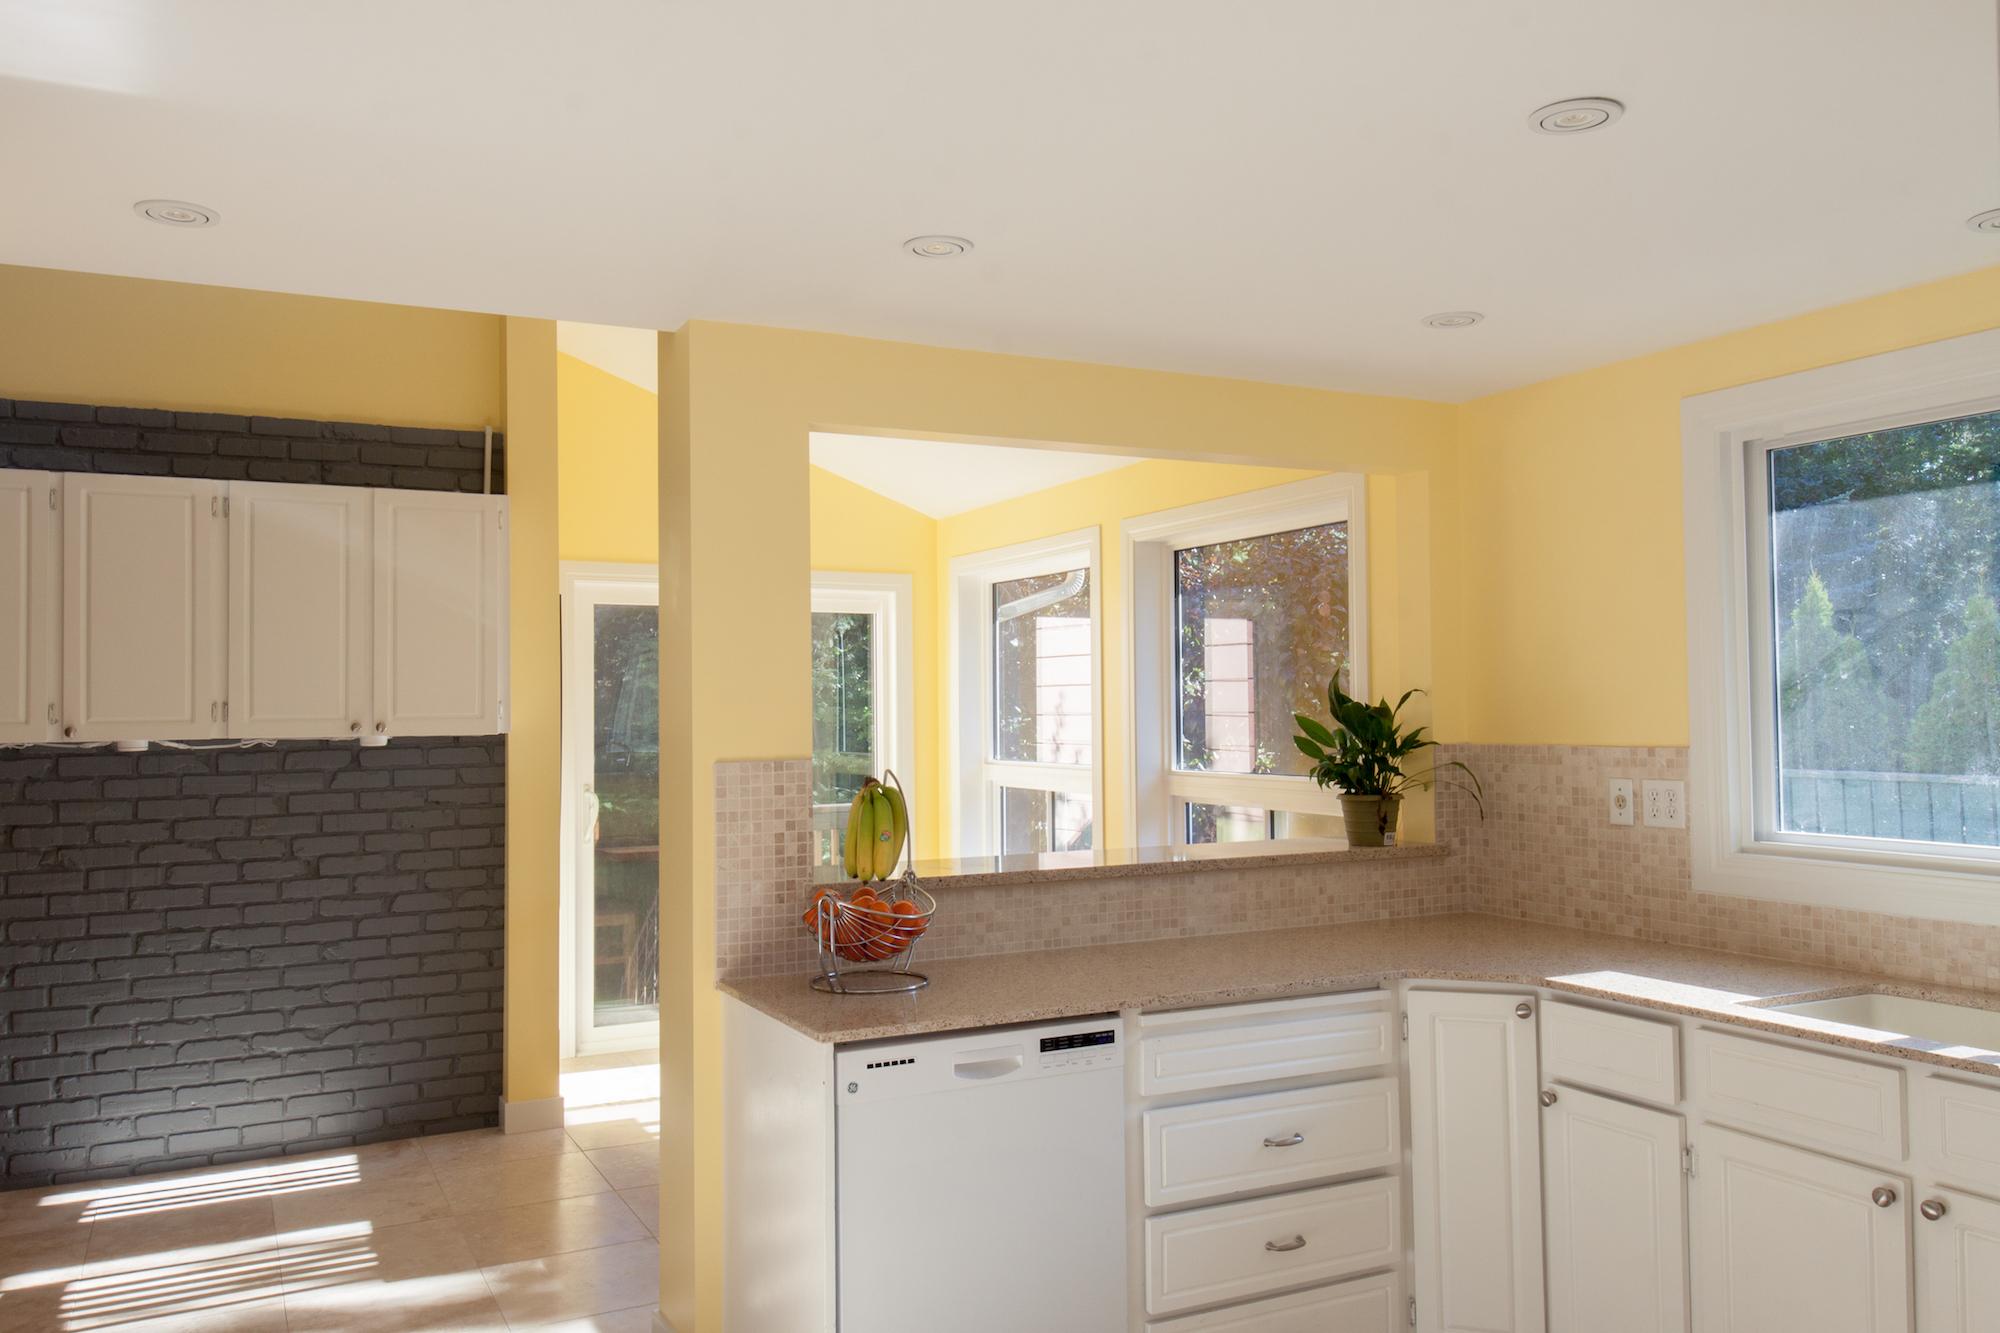 edmonton kitchen renovations